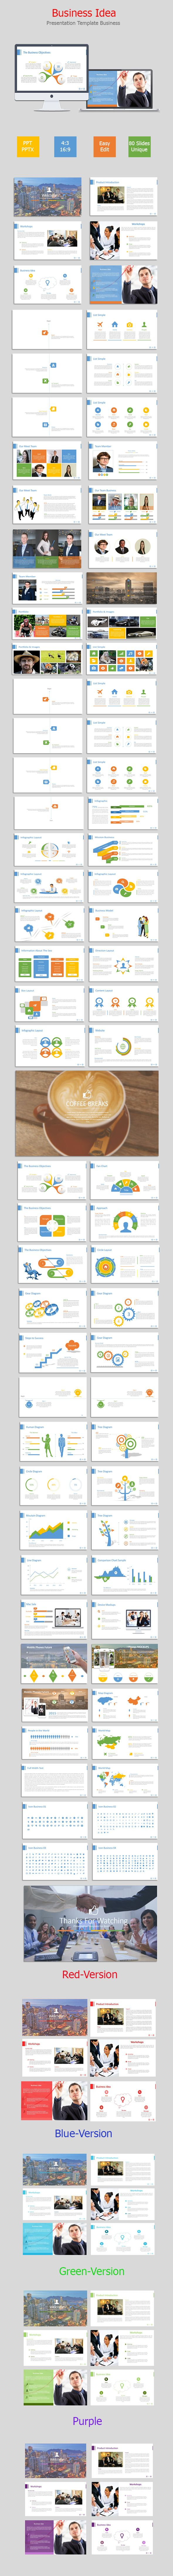 Business Idea PowerPoint Presentation Template #design #slides #powerpoint Download: http://graphicriver.net/item/business-idea/11418209?ref=ksioks